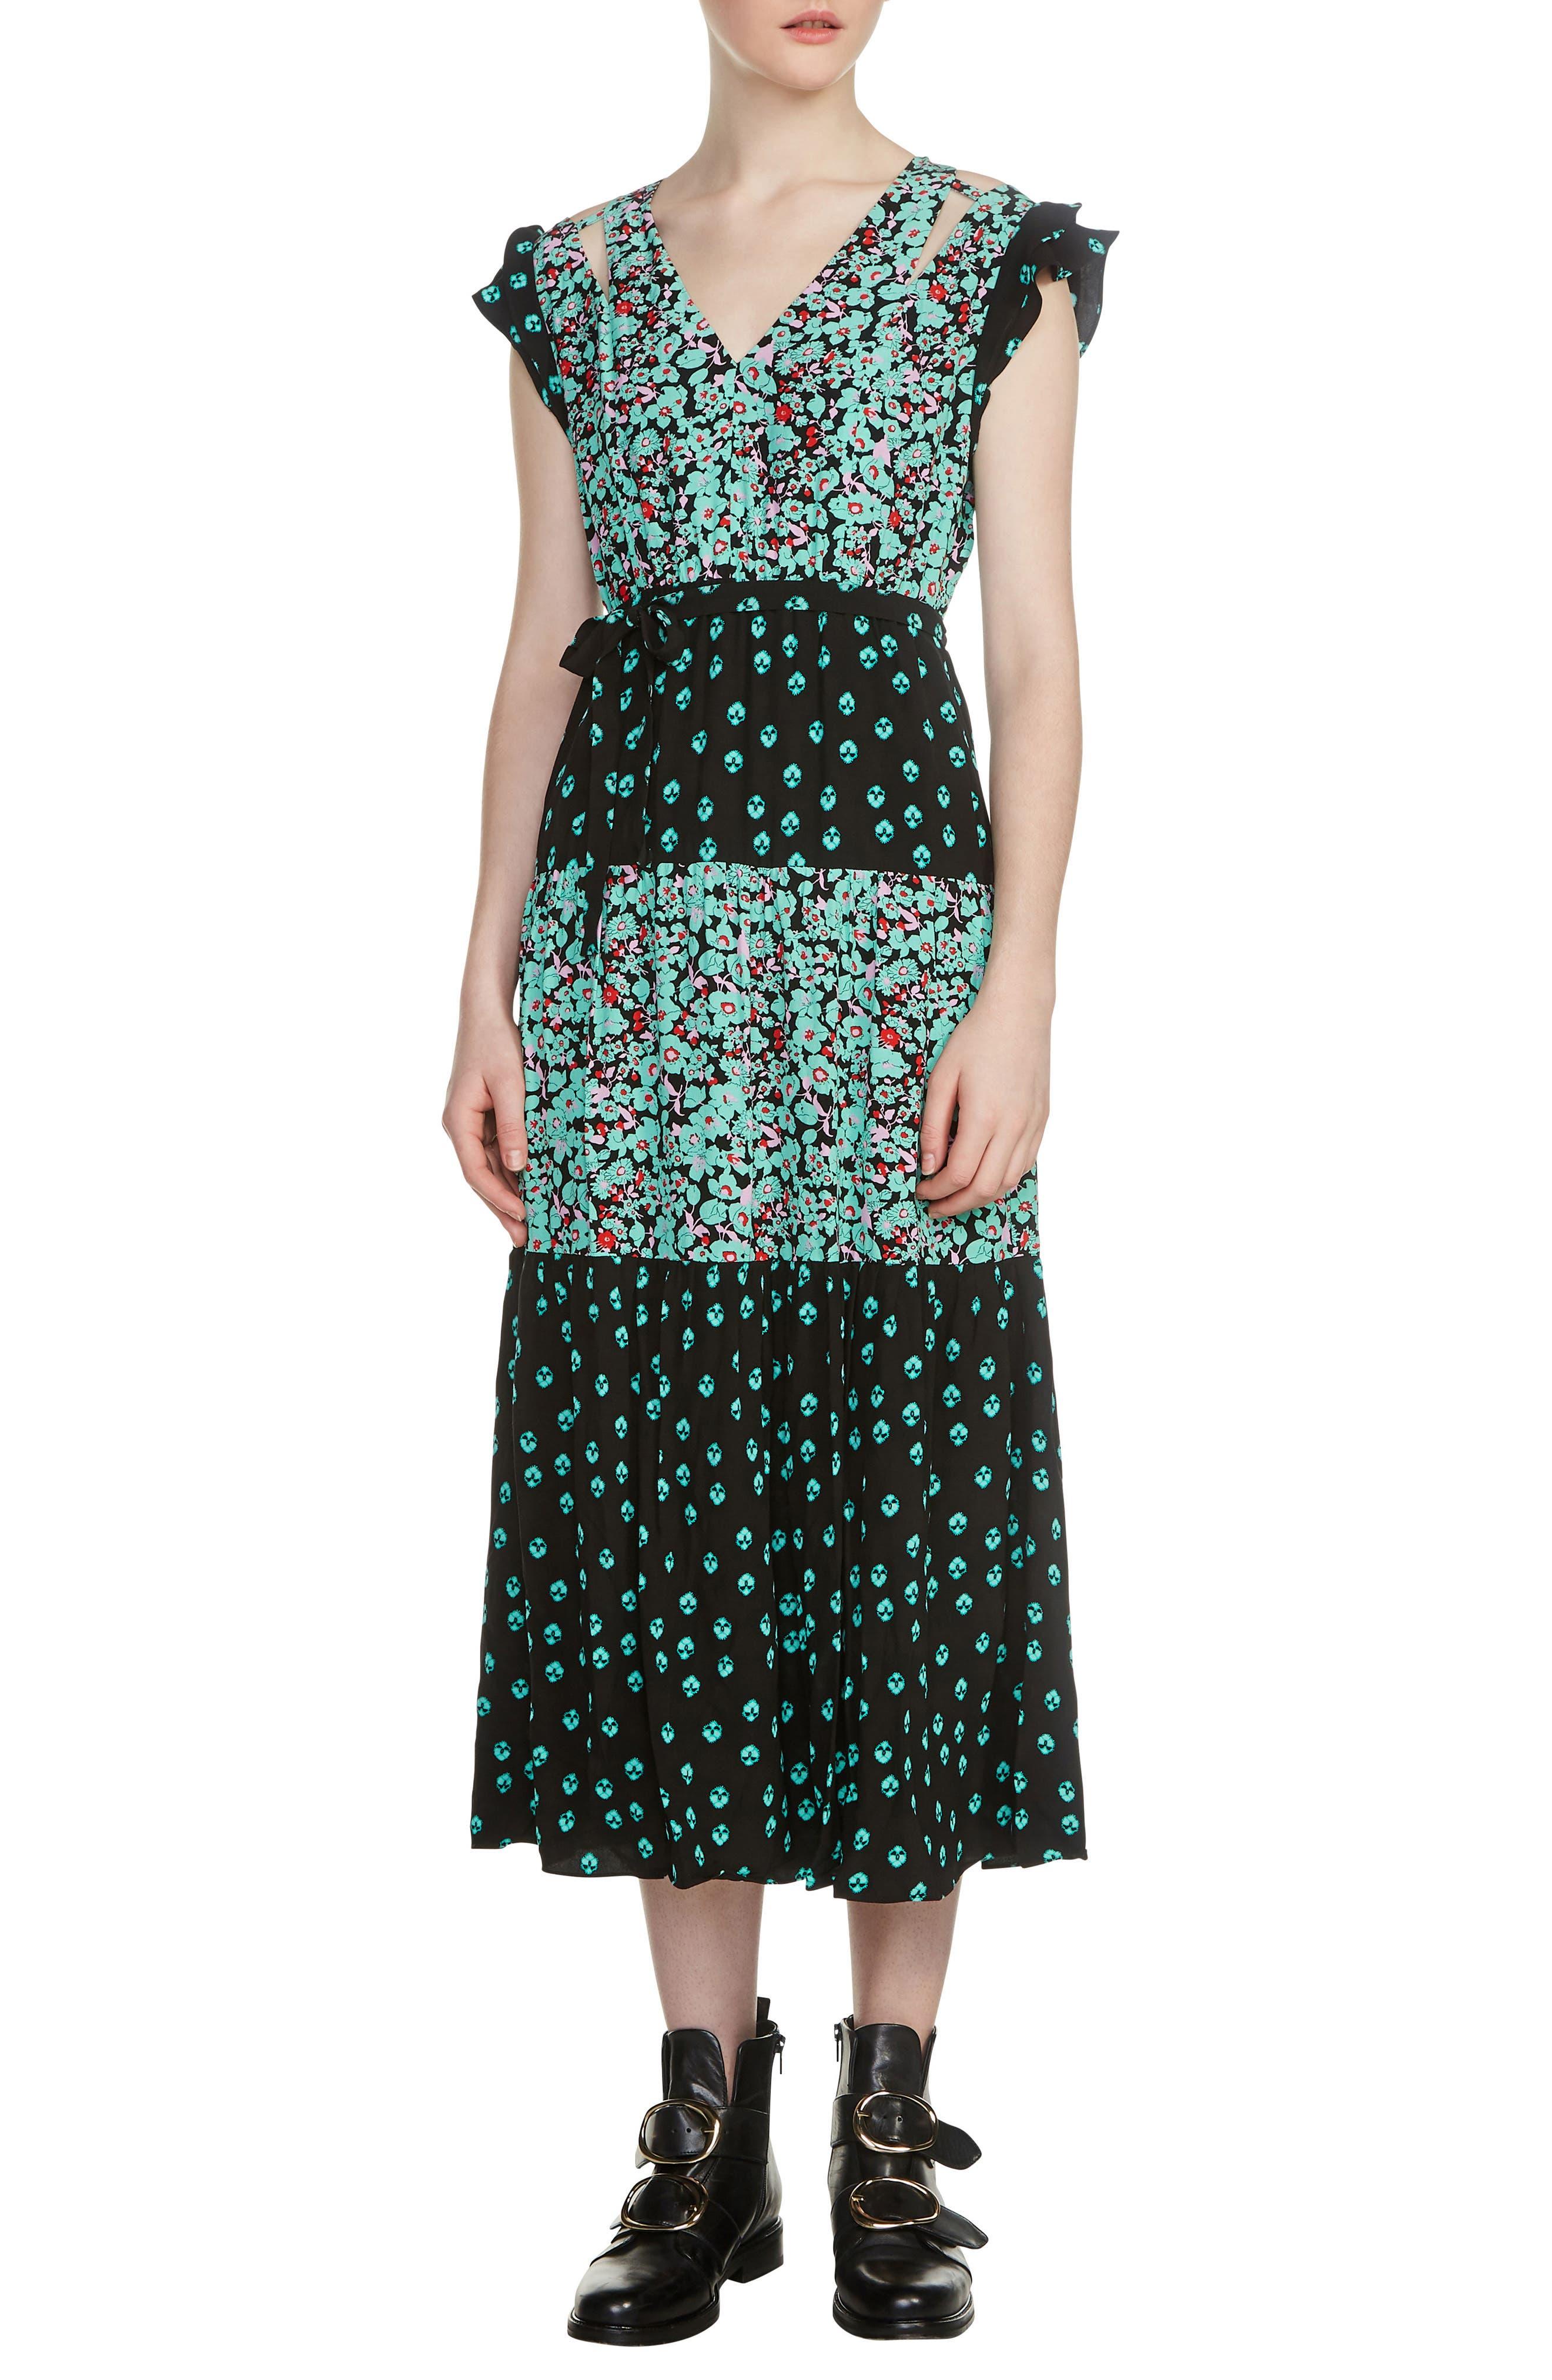 Renoli Mixed Print Midi Dress,                             Main thumbnail 1, color,                             300